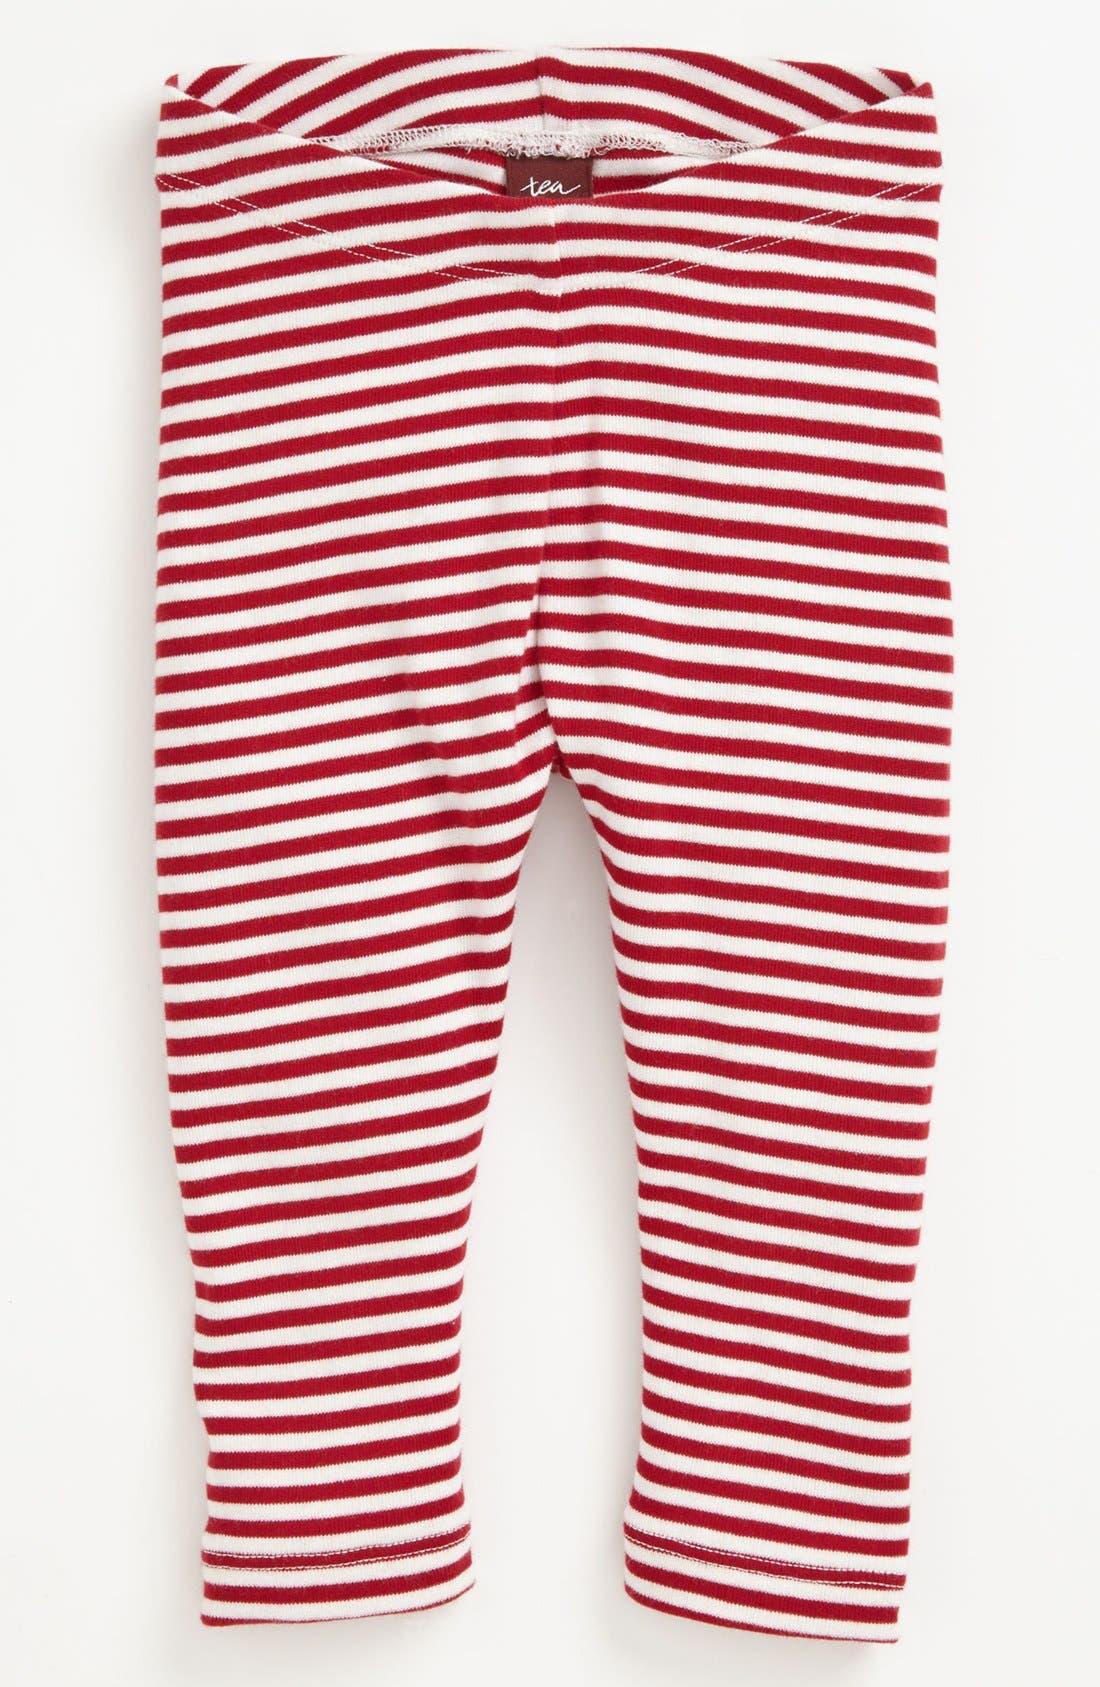 Alternate Image 1 Selected - Tea Collection 'Pop Stripe' Leggings (Little Girls & Big Girls)